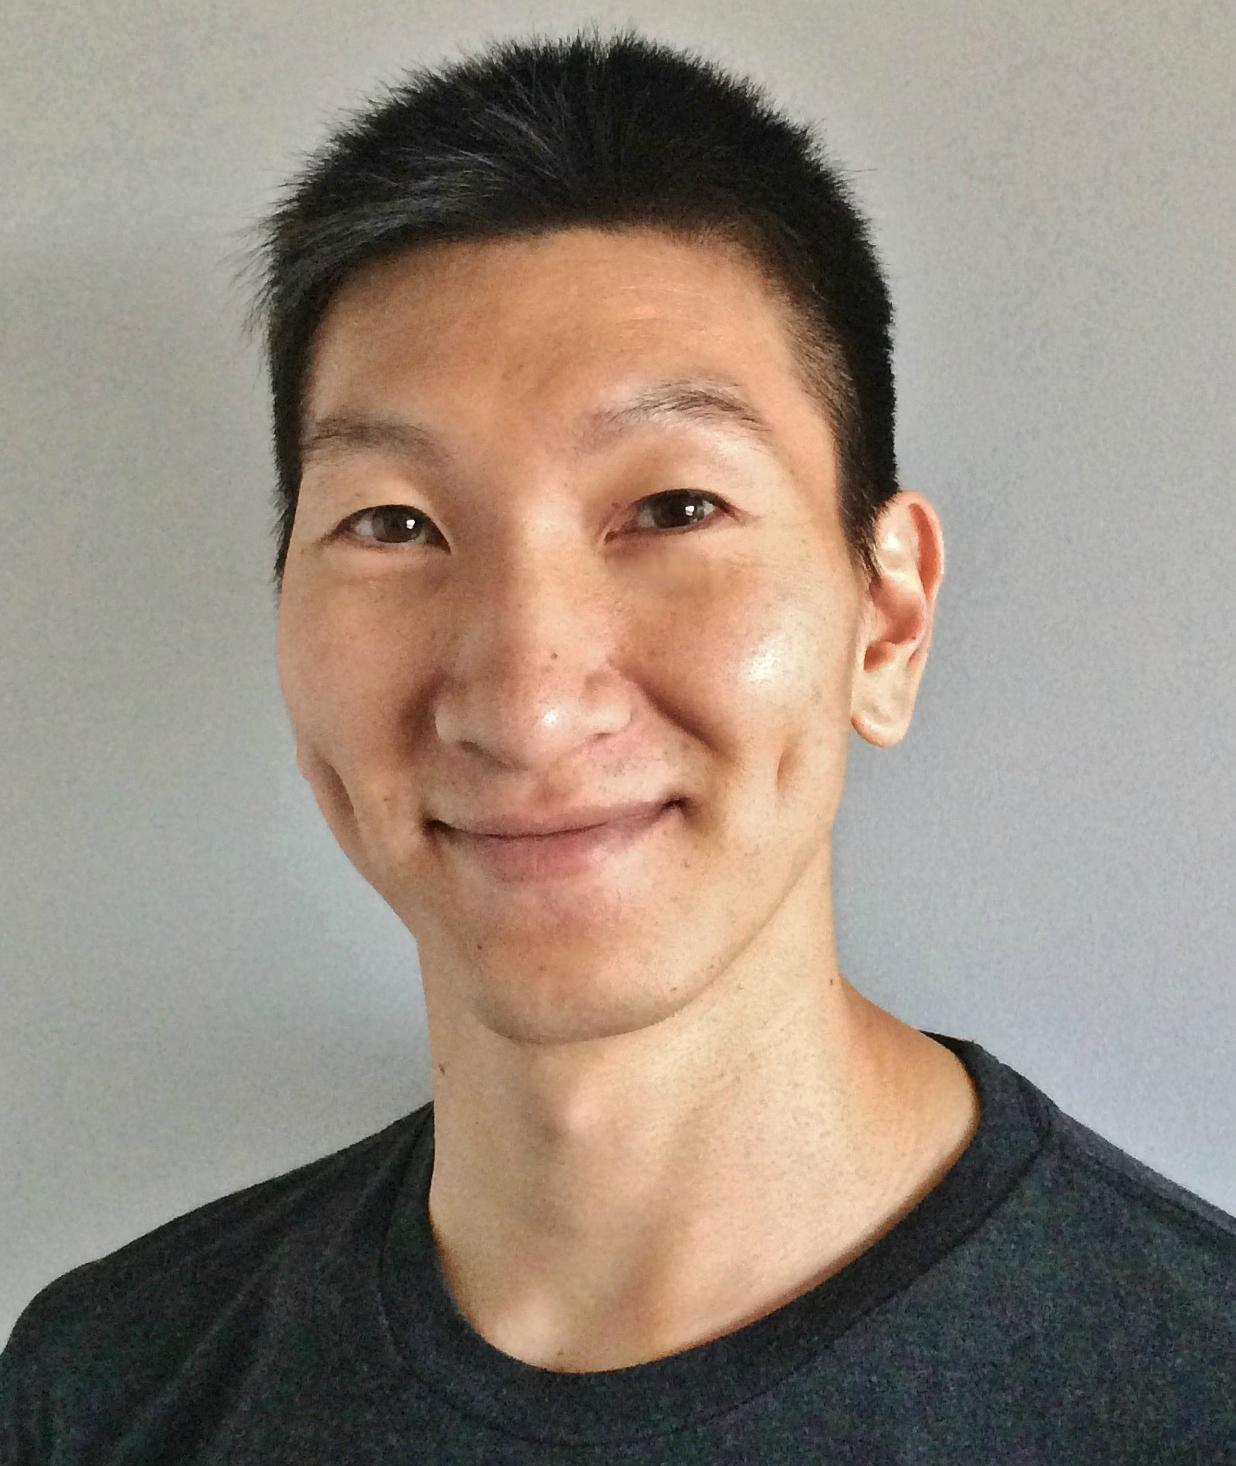 Daehan Kim